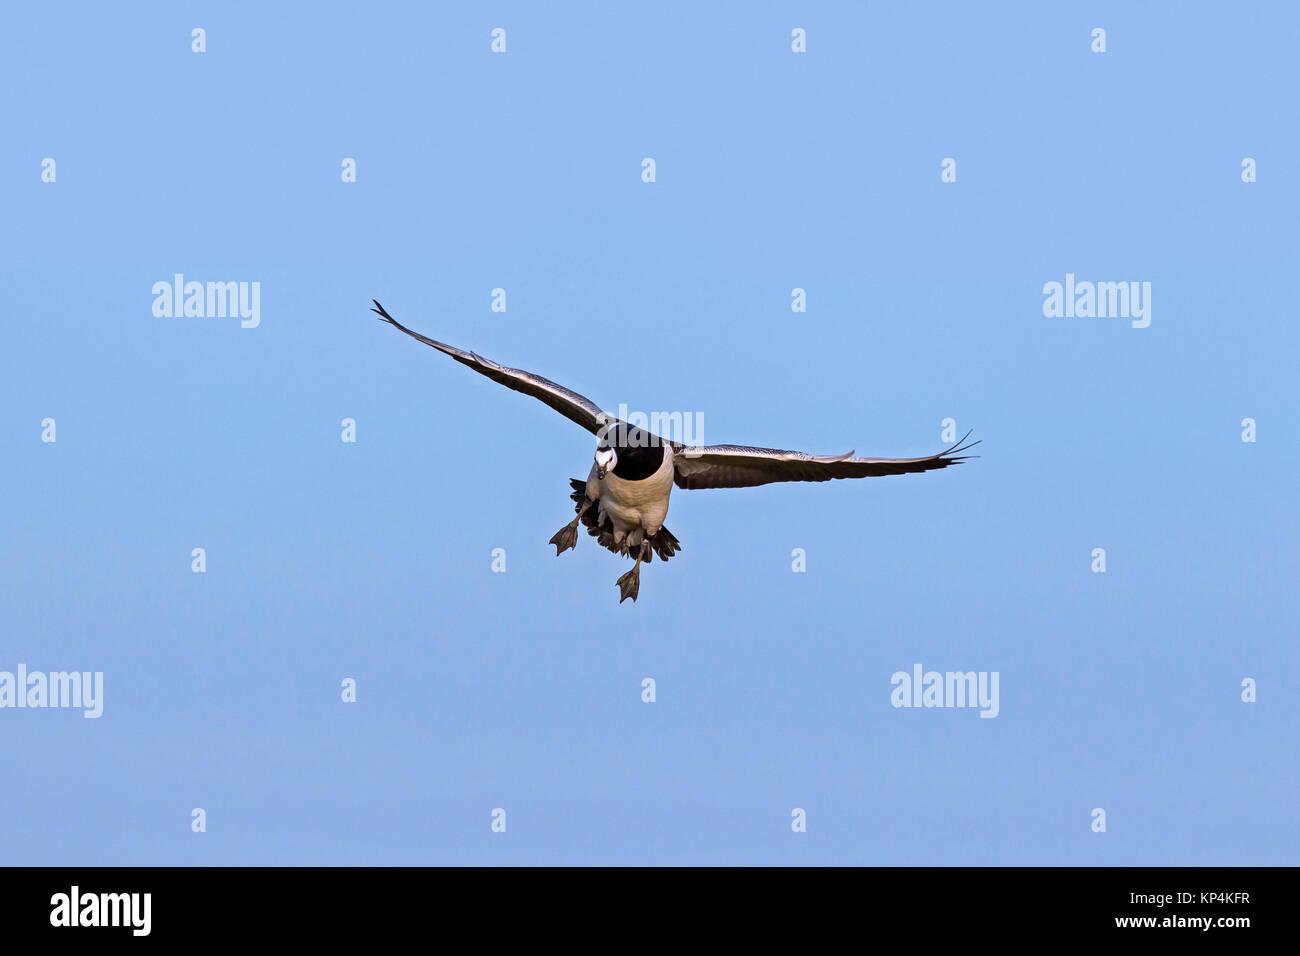 Barnacle goose (Branta leucopsis) in flight and landing - Stock Image